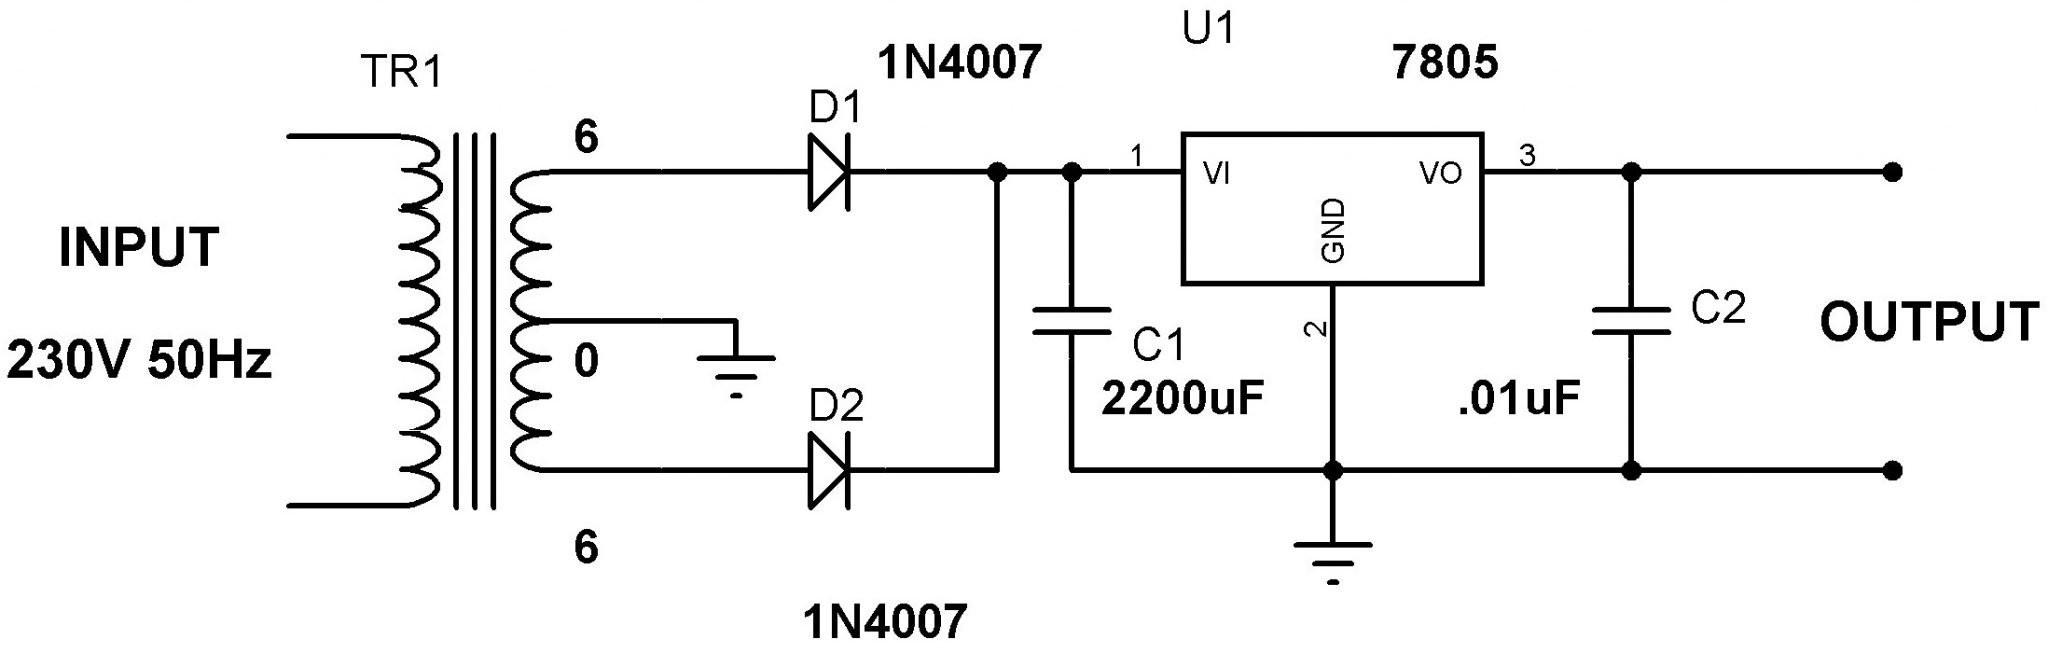 5V Power Supply Circuit using 7805 Voltage Regulator